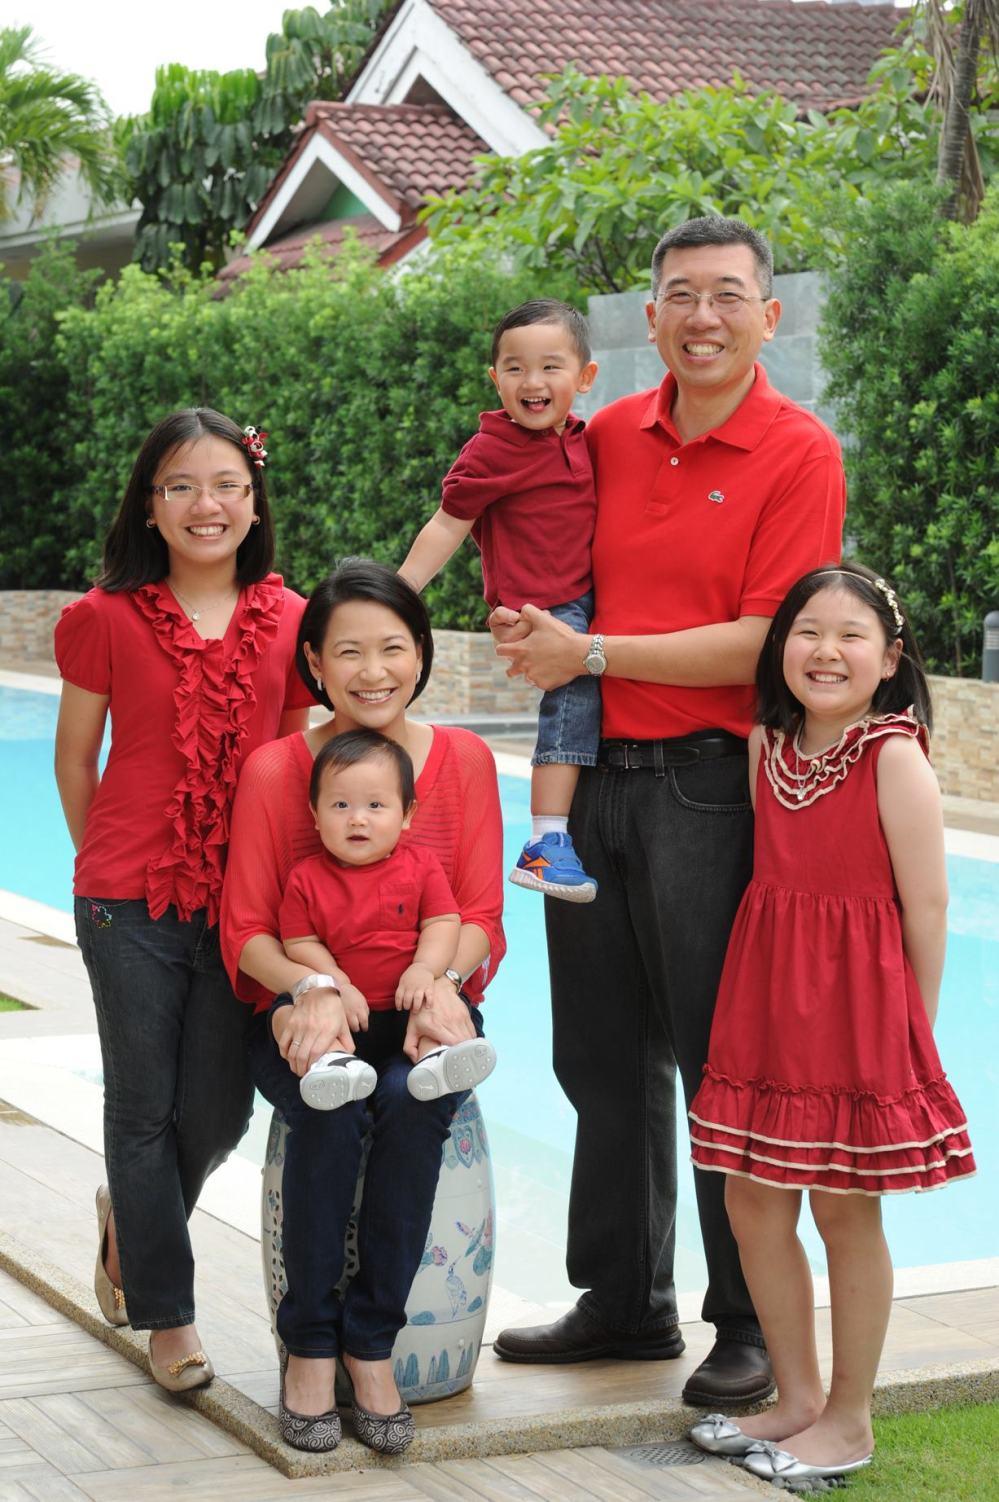 glenn jackie family red